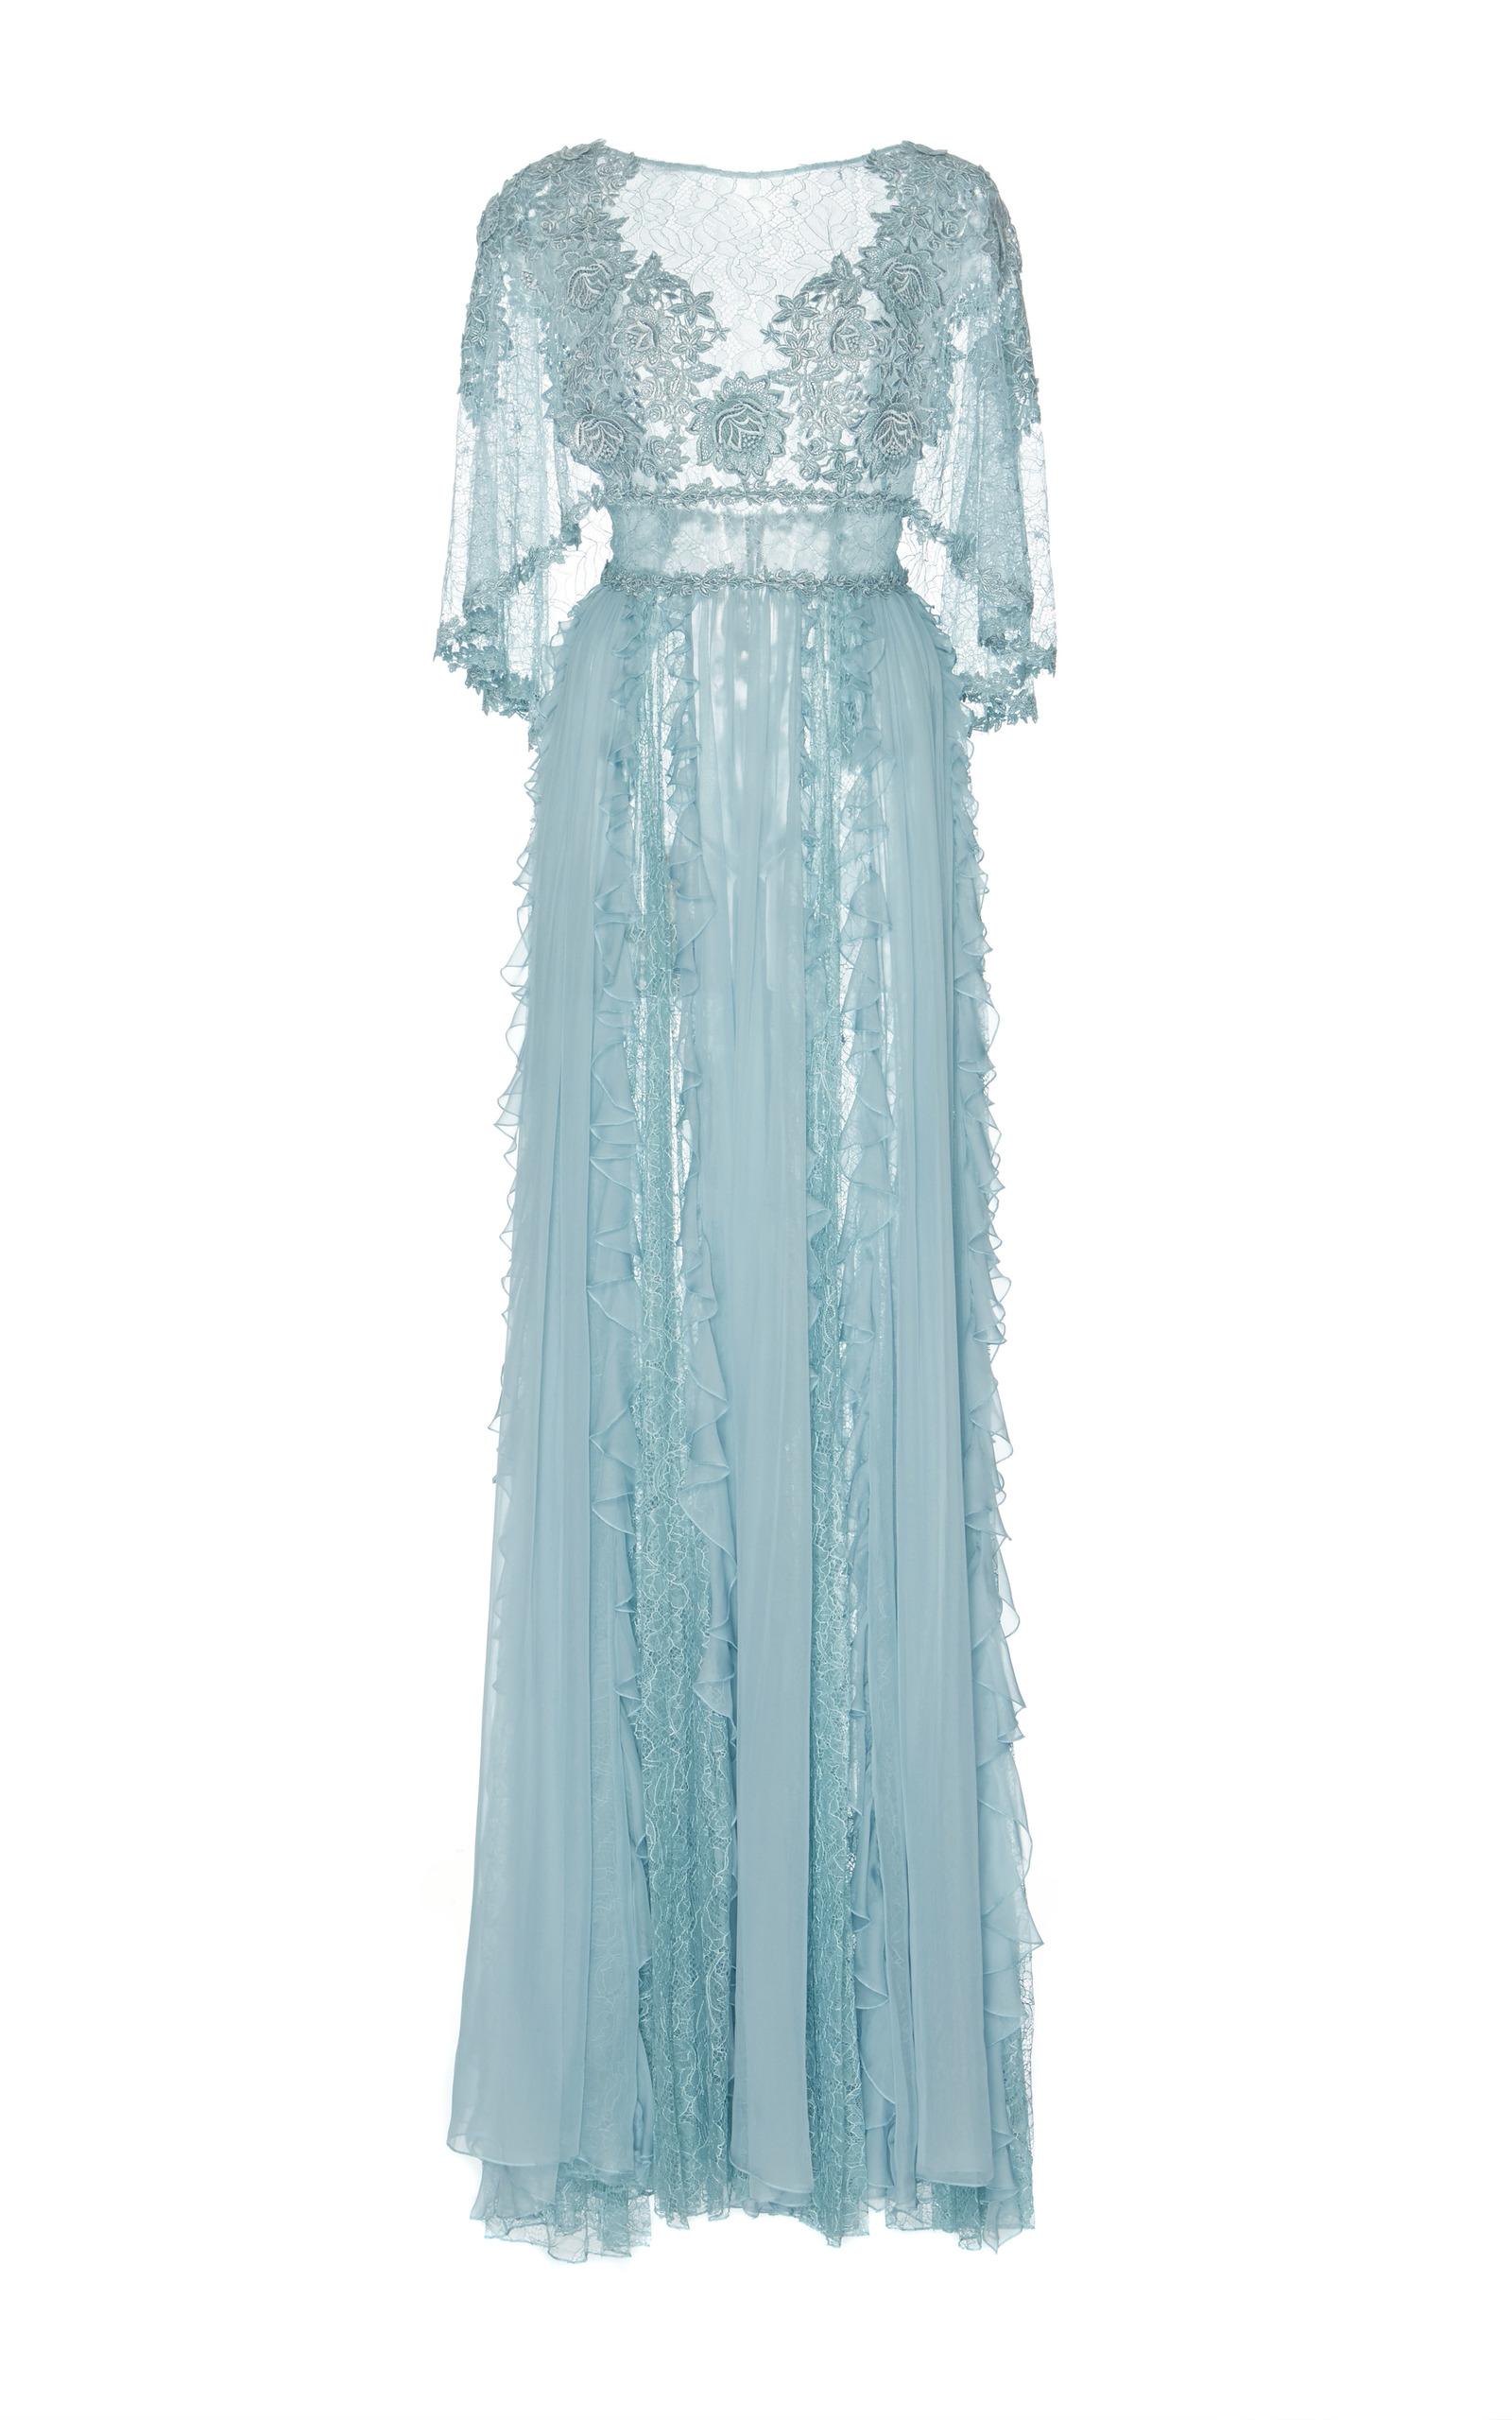 Blue Chiffon Dress Zuhair Murad – Fashion dresses